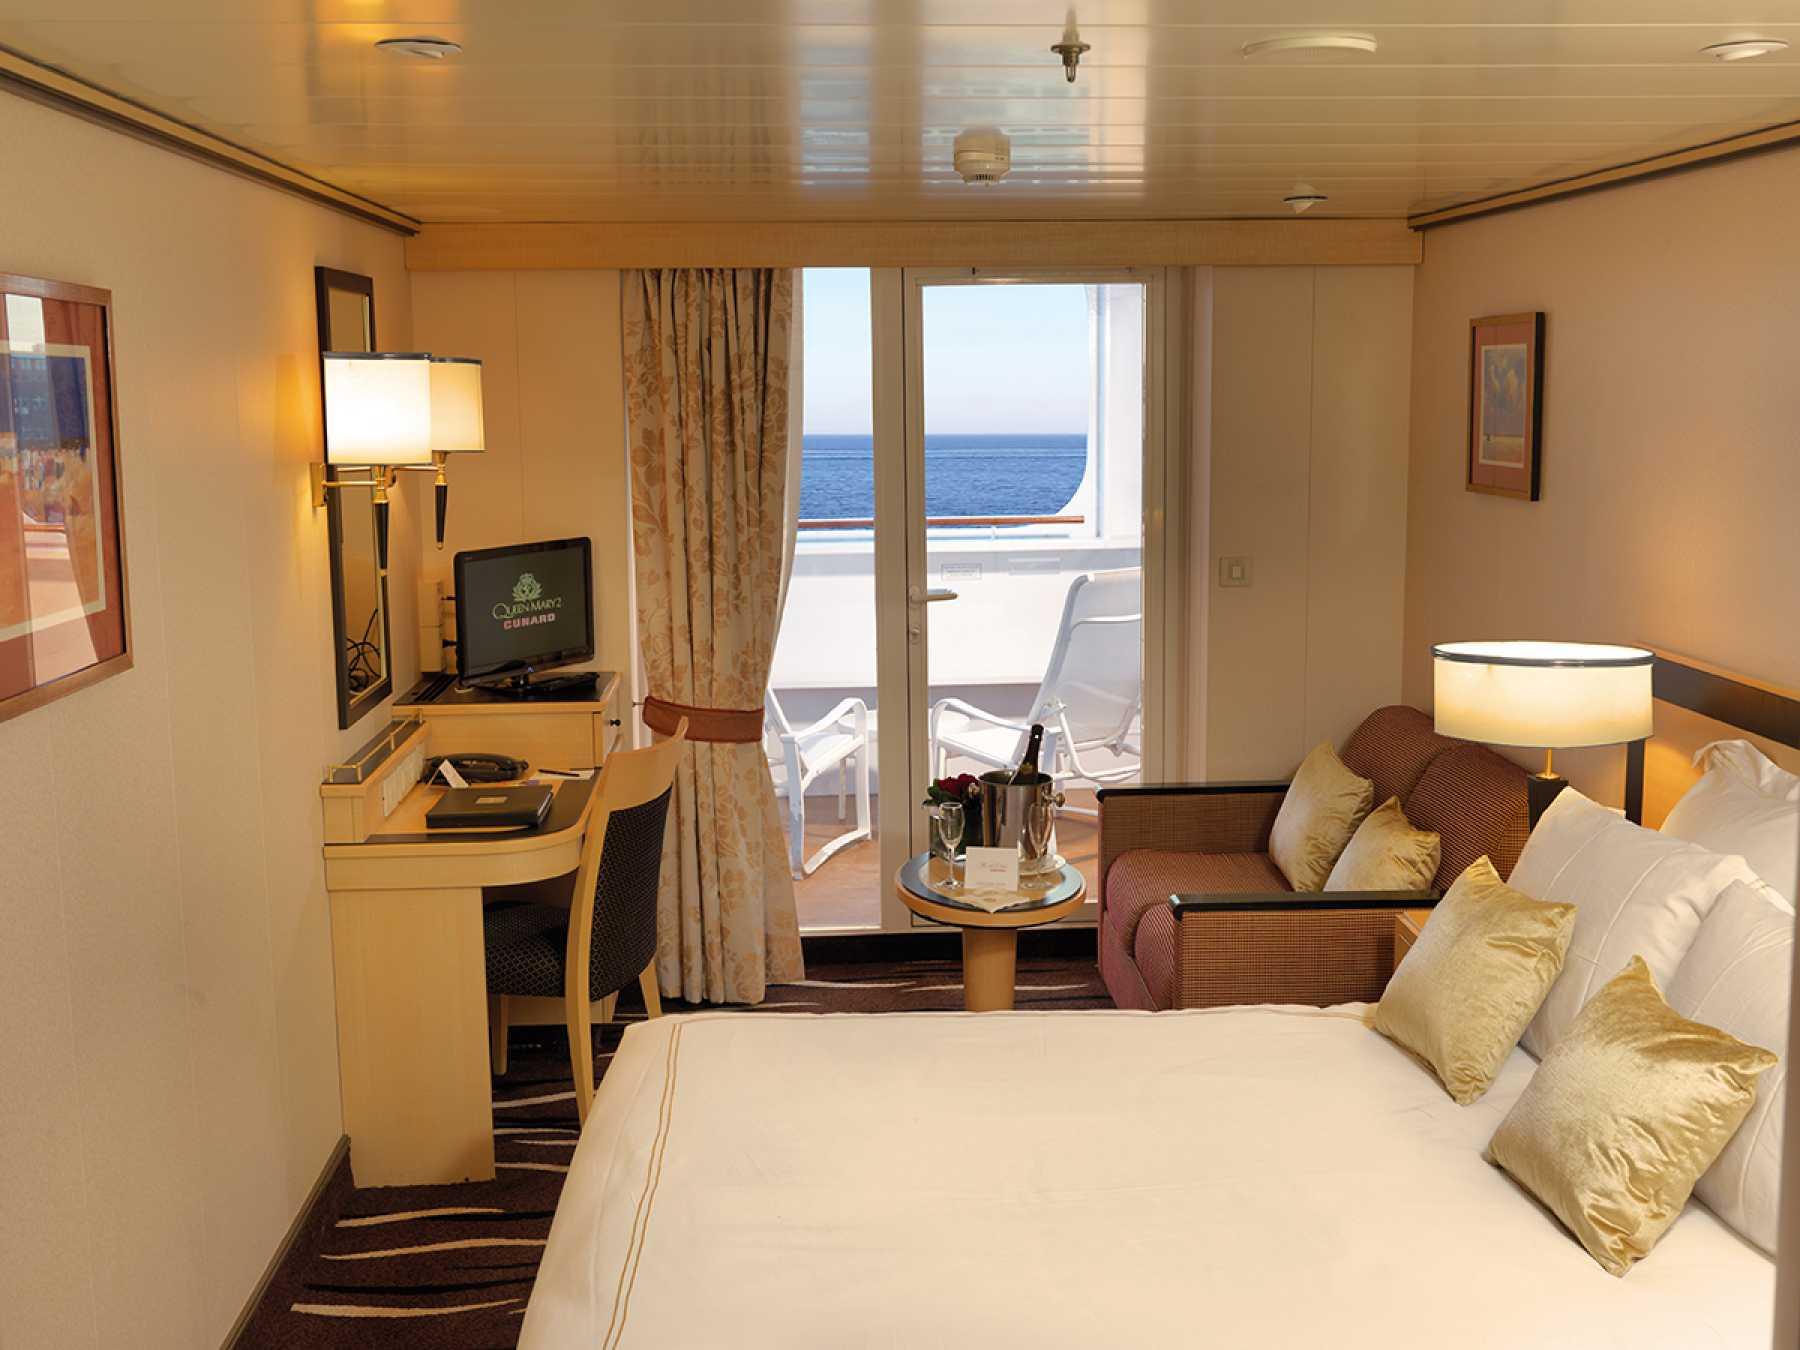 cunard queen mary 2 b1 premium balcony.JPG